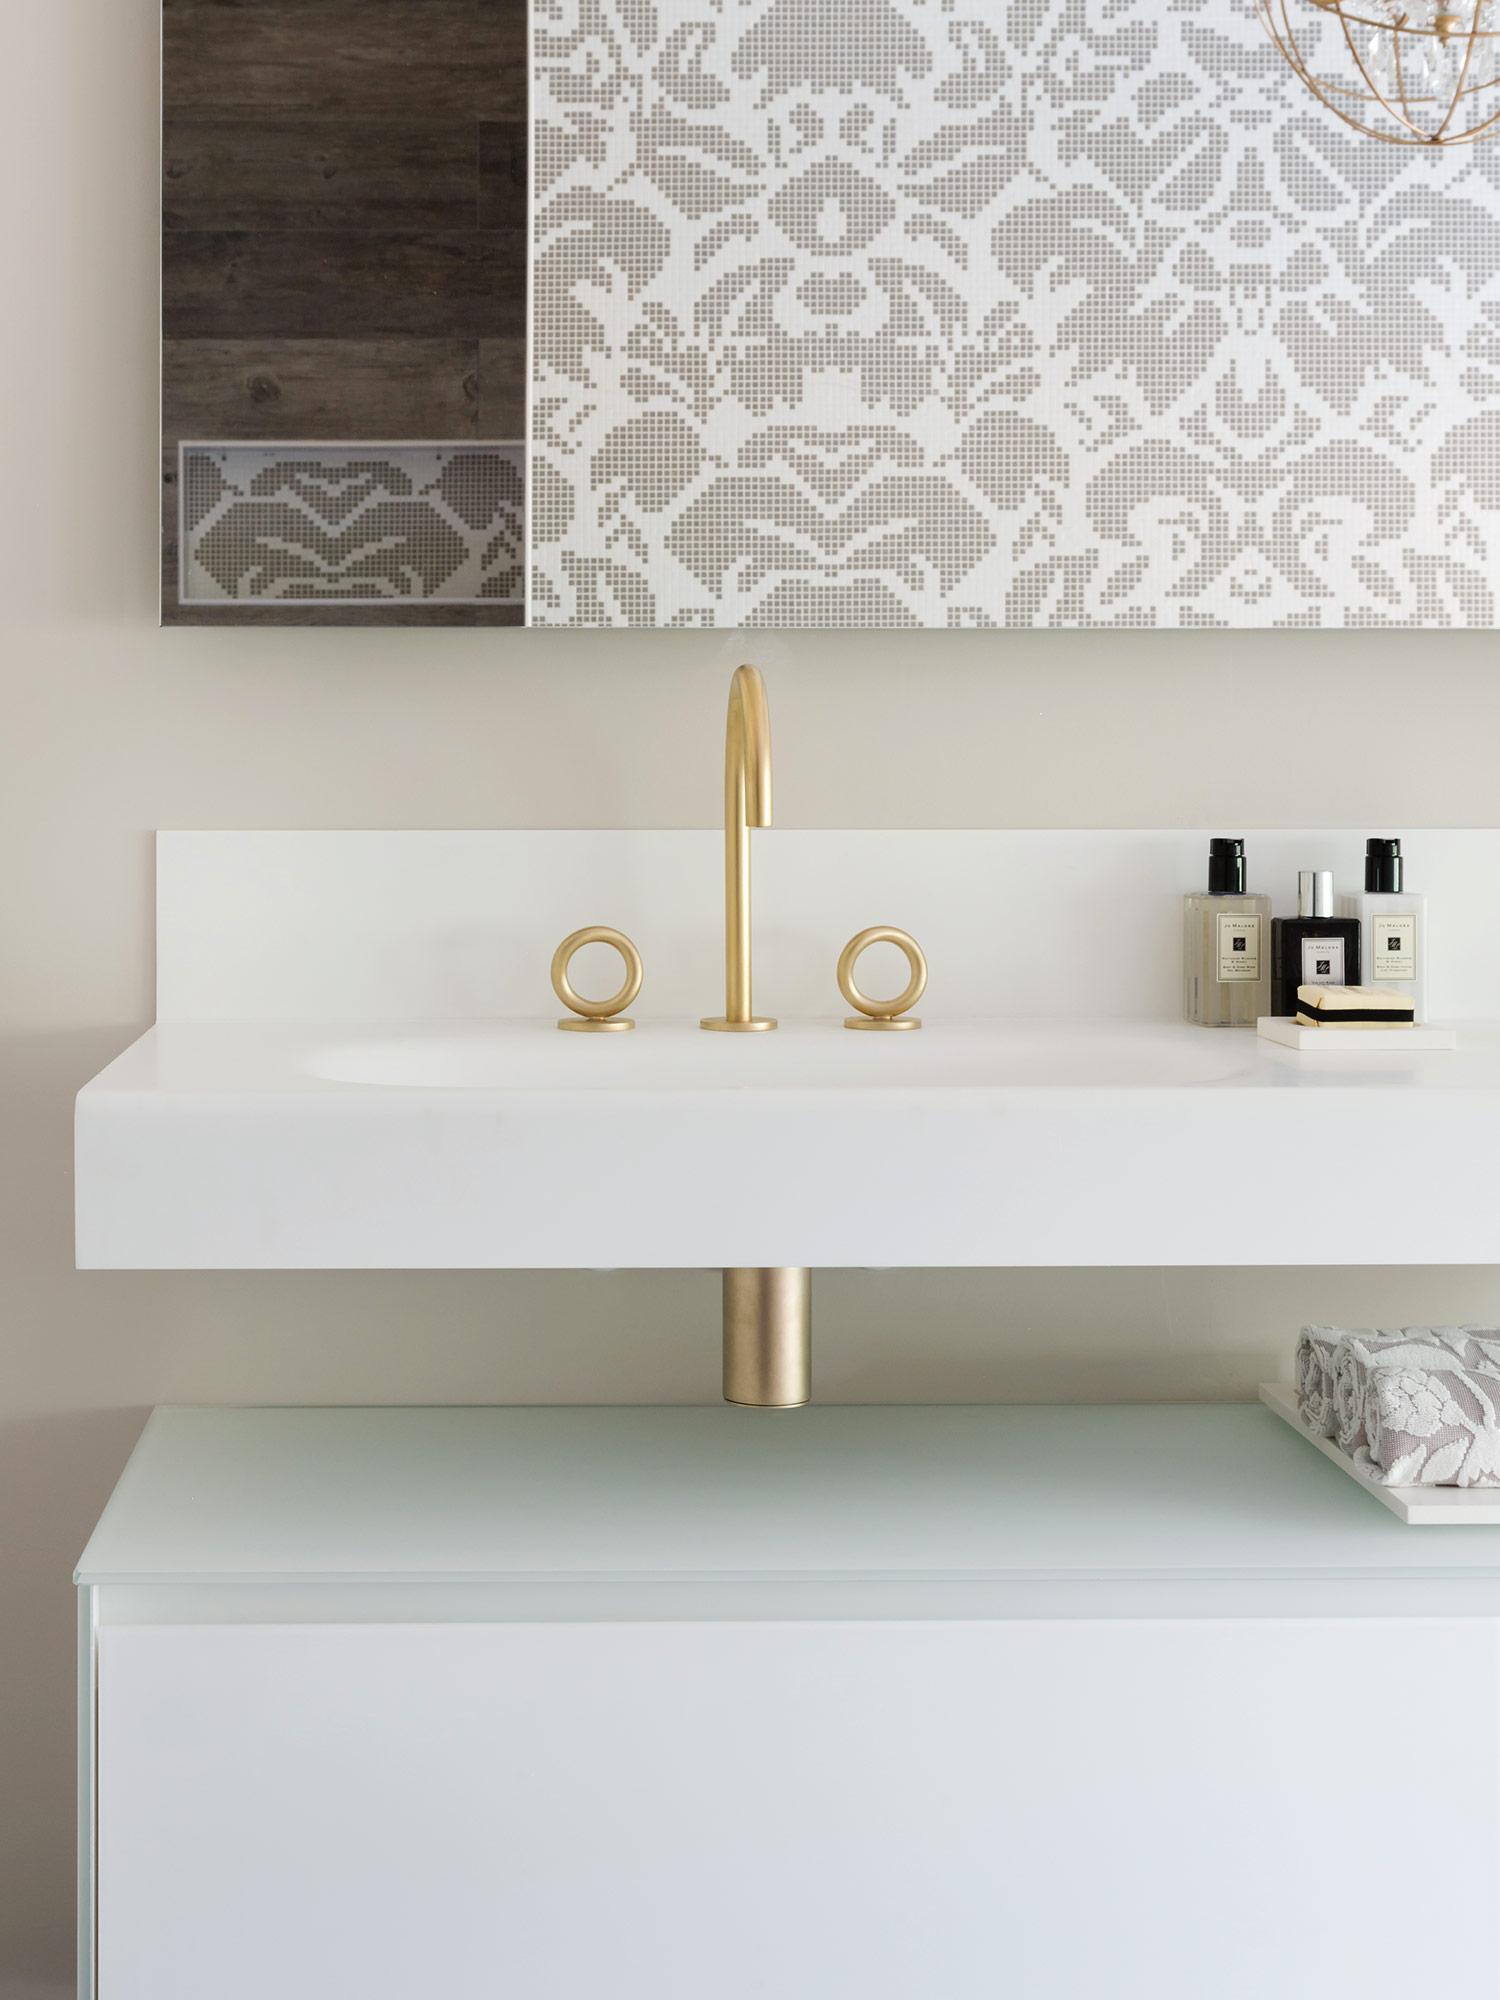 West One Bathrooms Case Studies: Oakdene (Image 4)